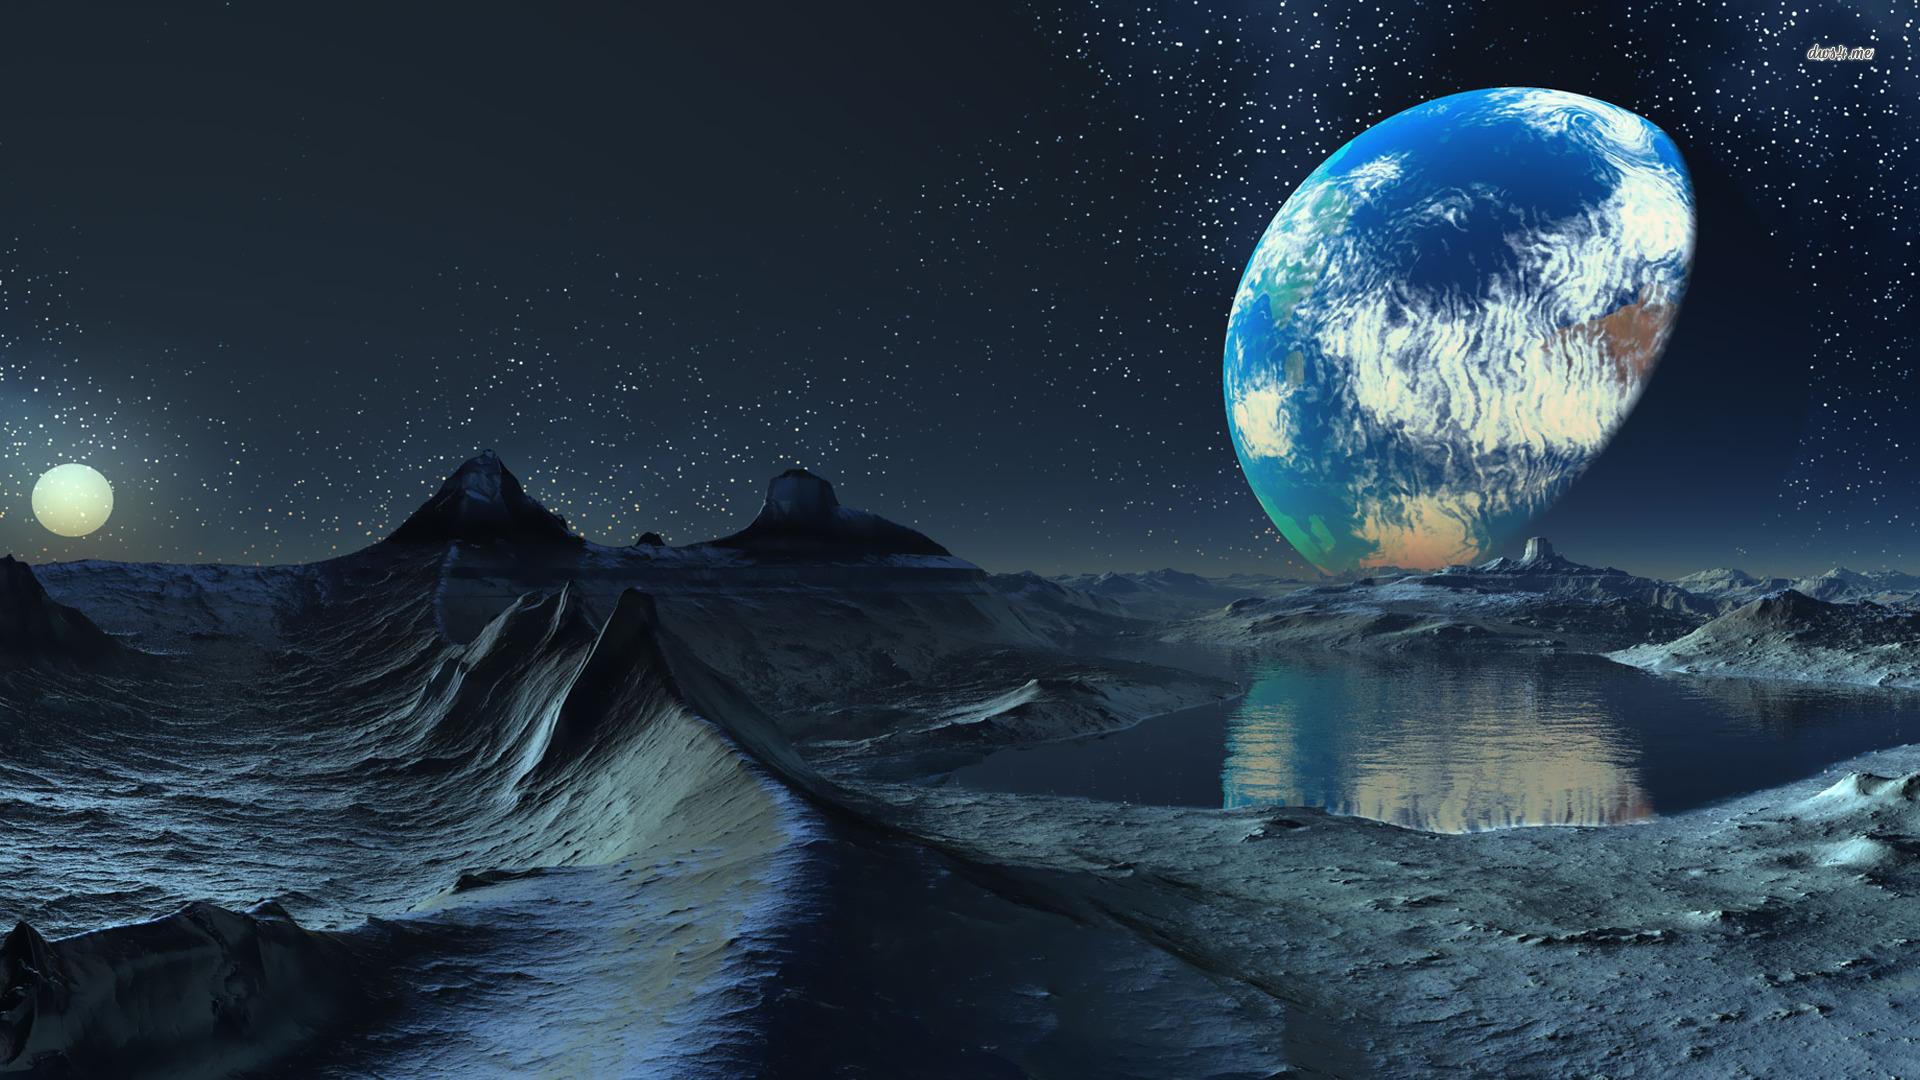 Lifeless planet wallpaper   Fantasy wallpapers   4049 1920x1080